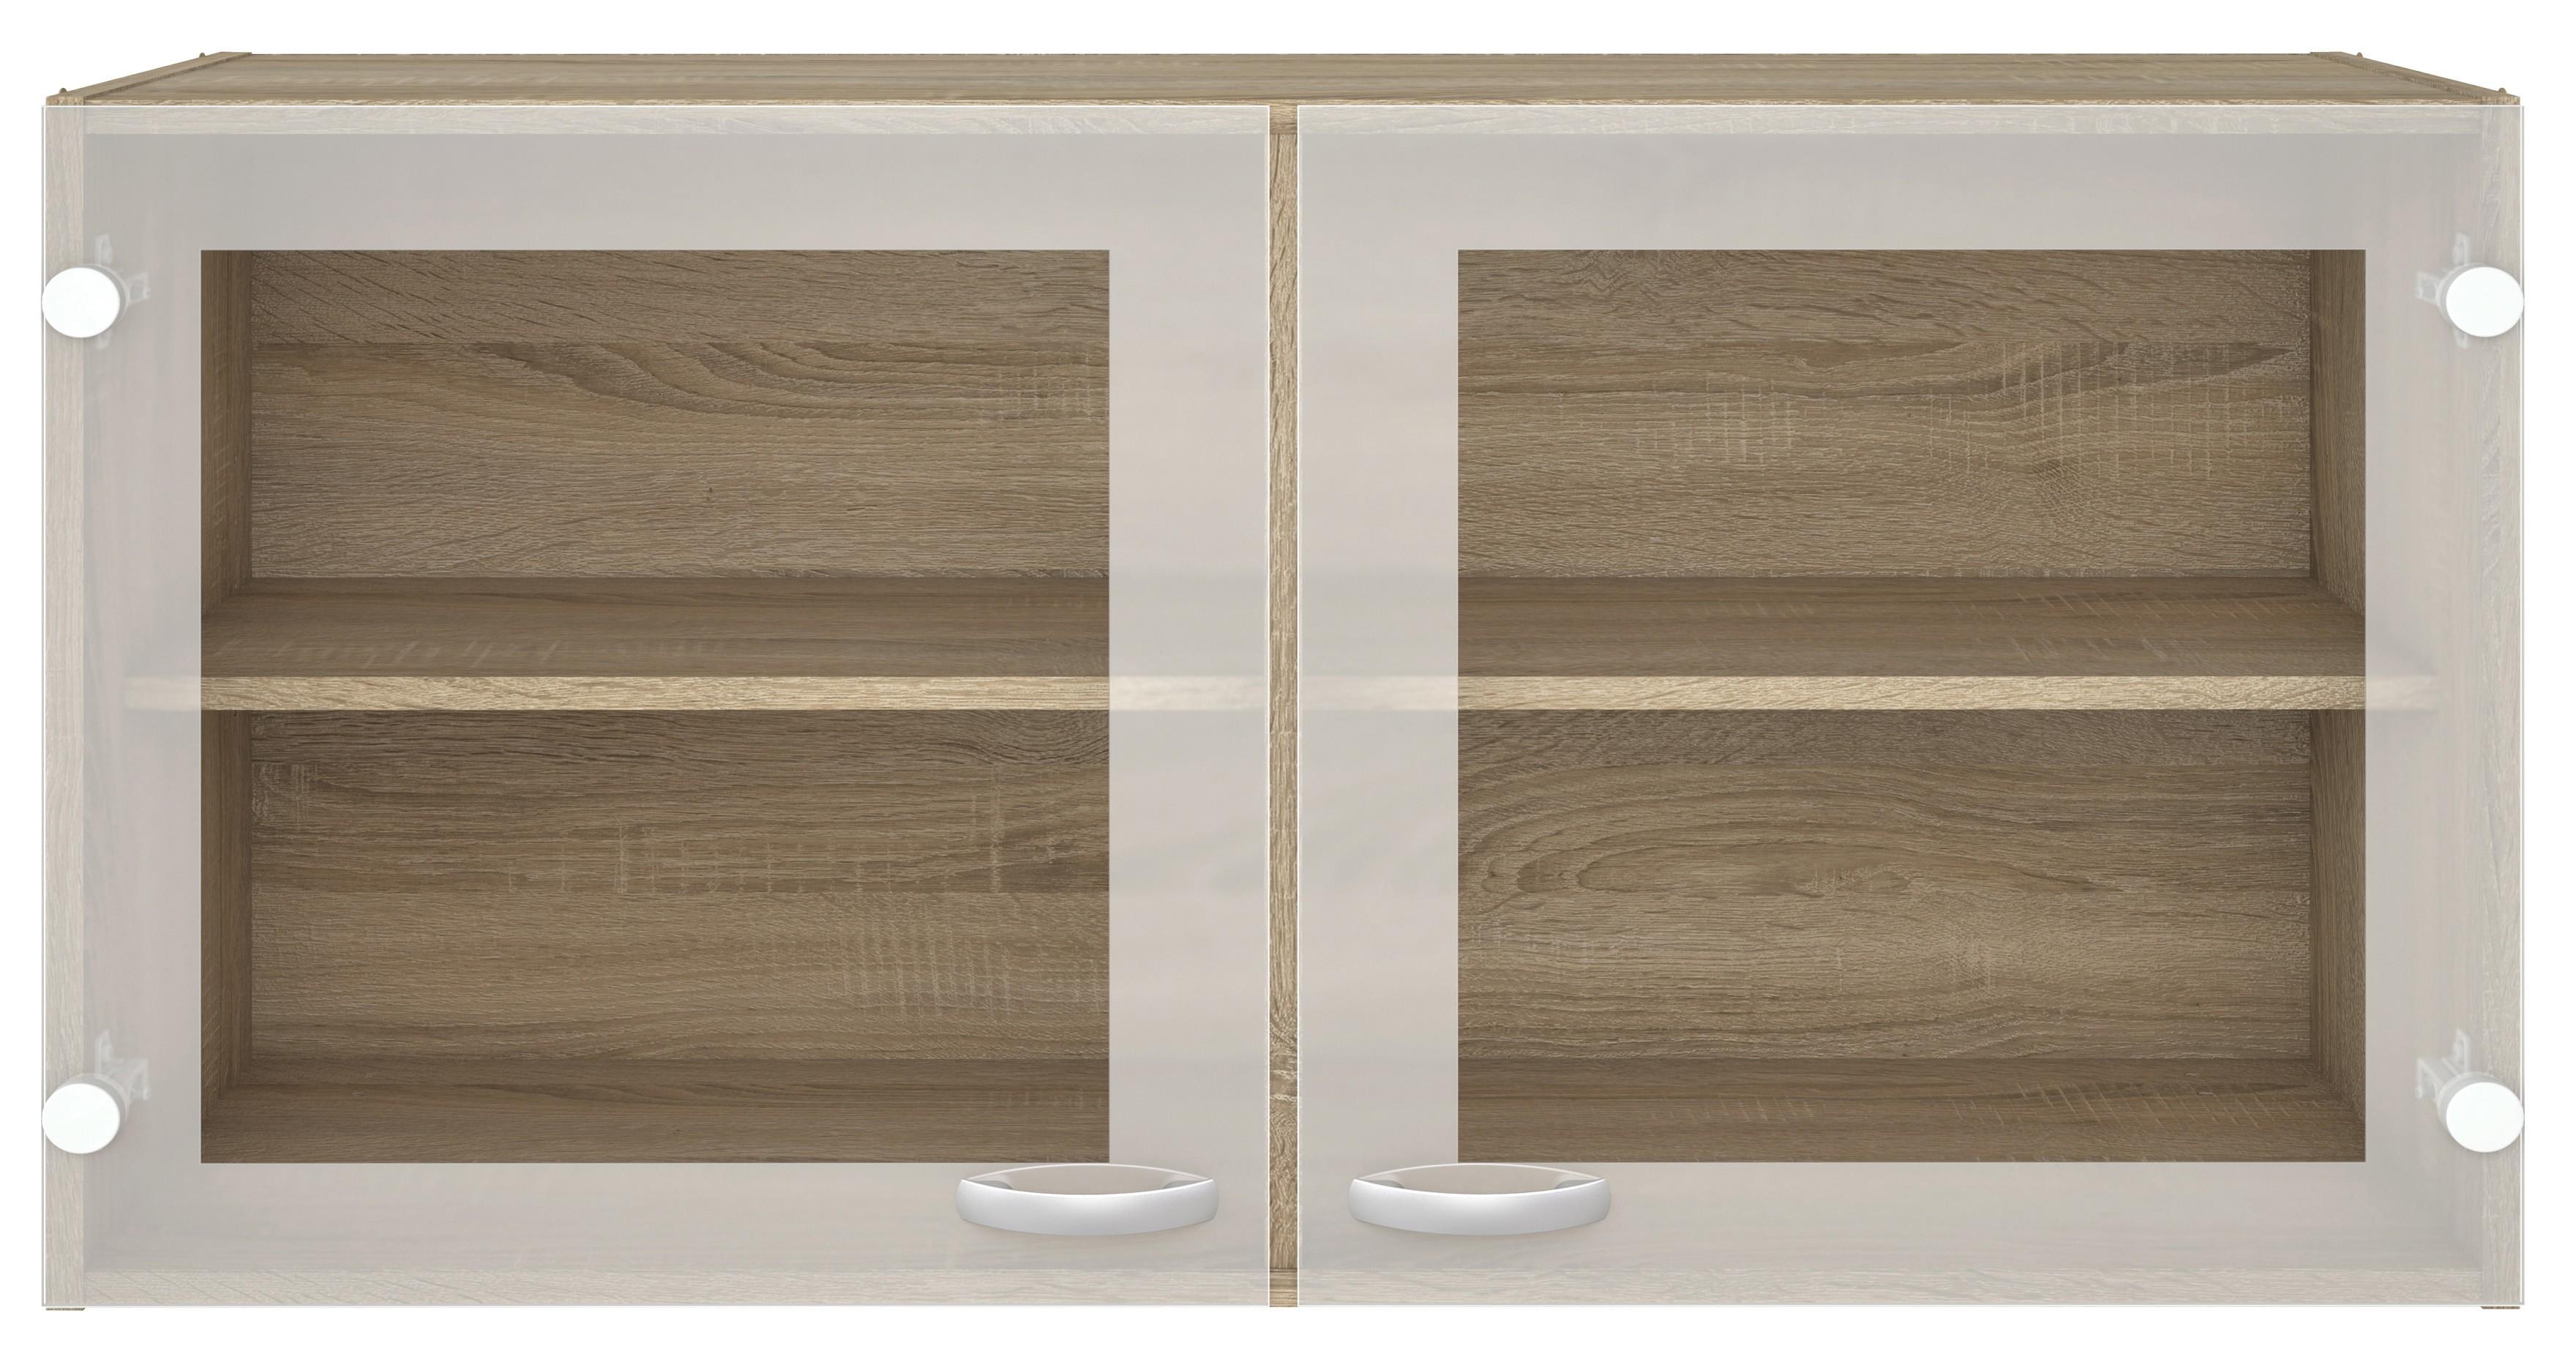 Pensile cucina 2 ante vetro legno finitura quercia cm 98x34x54h ...